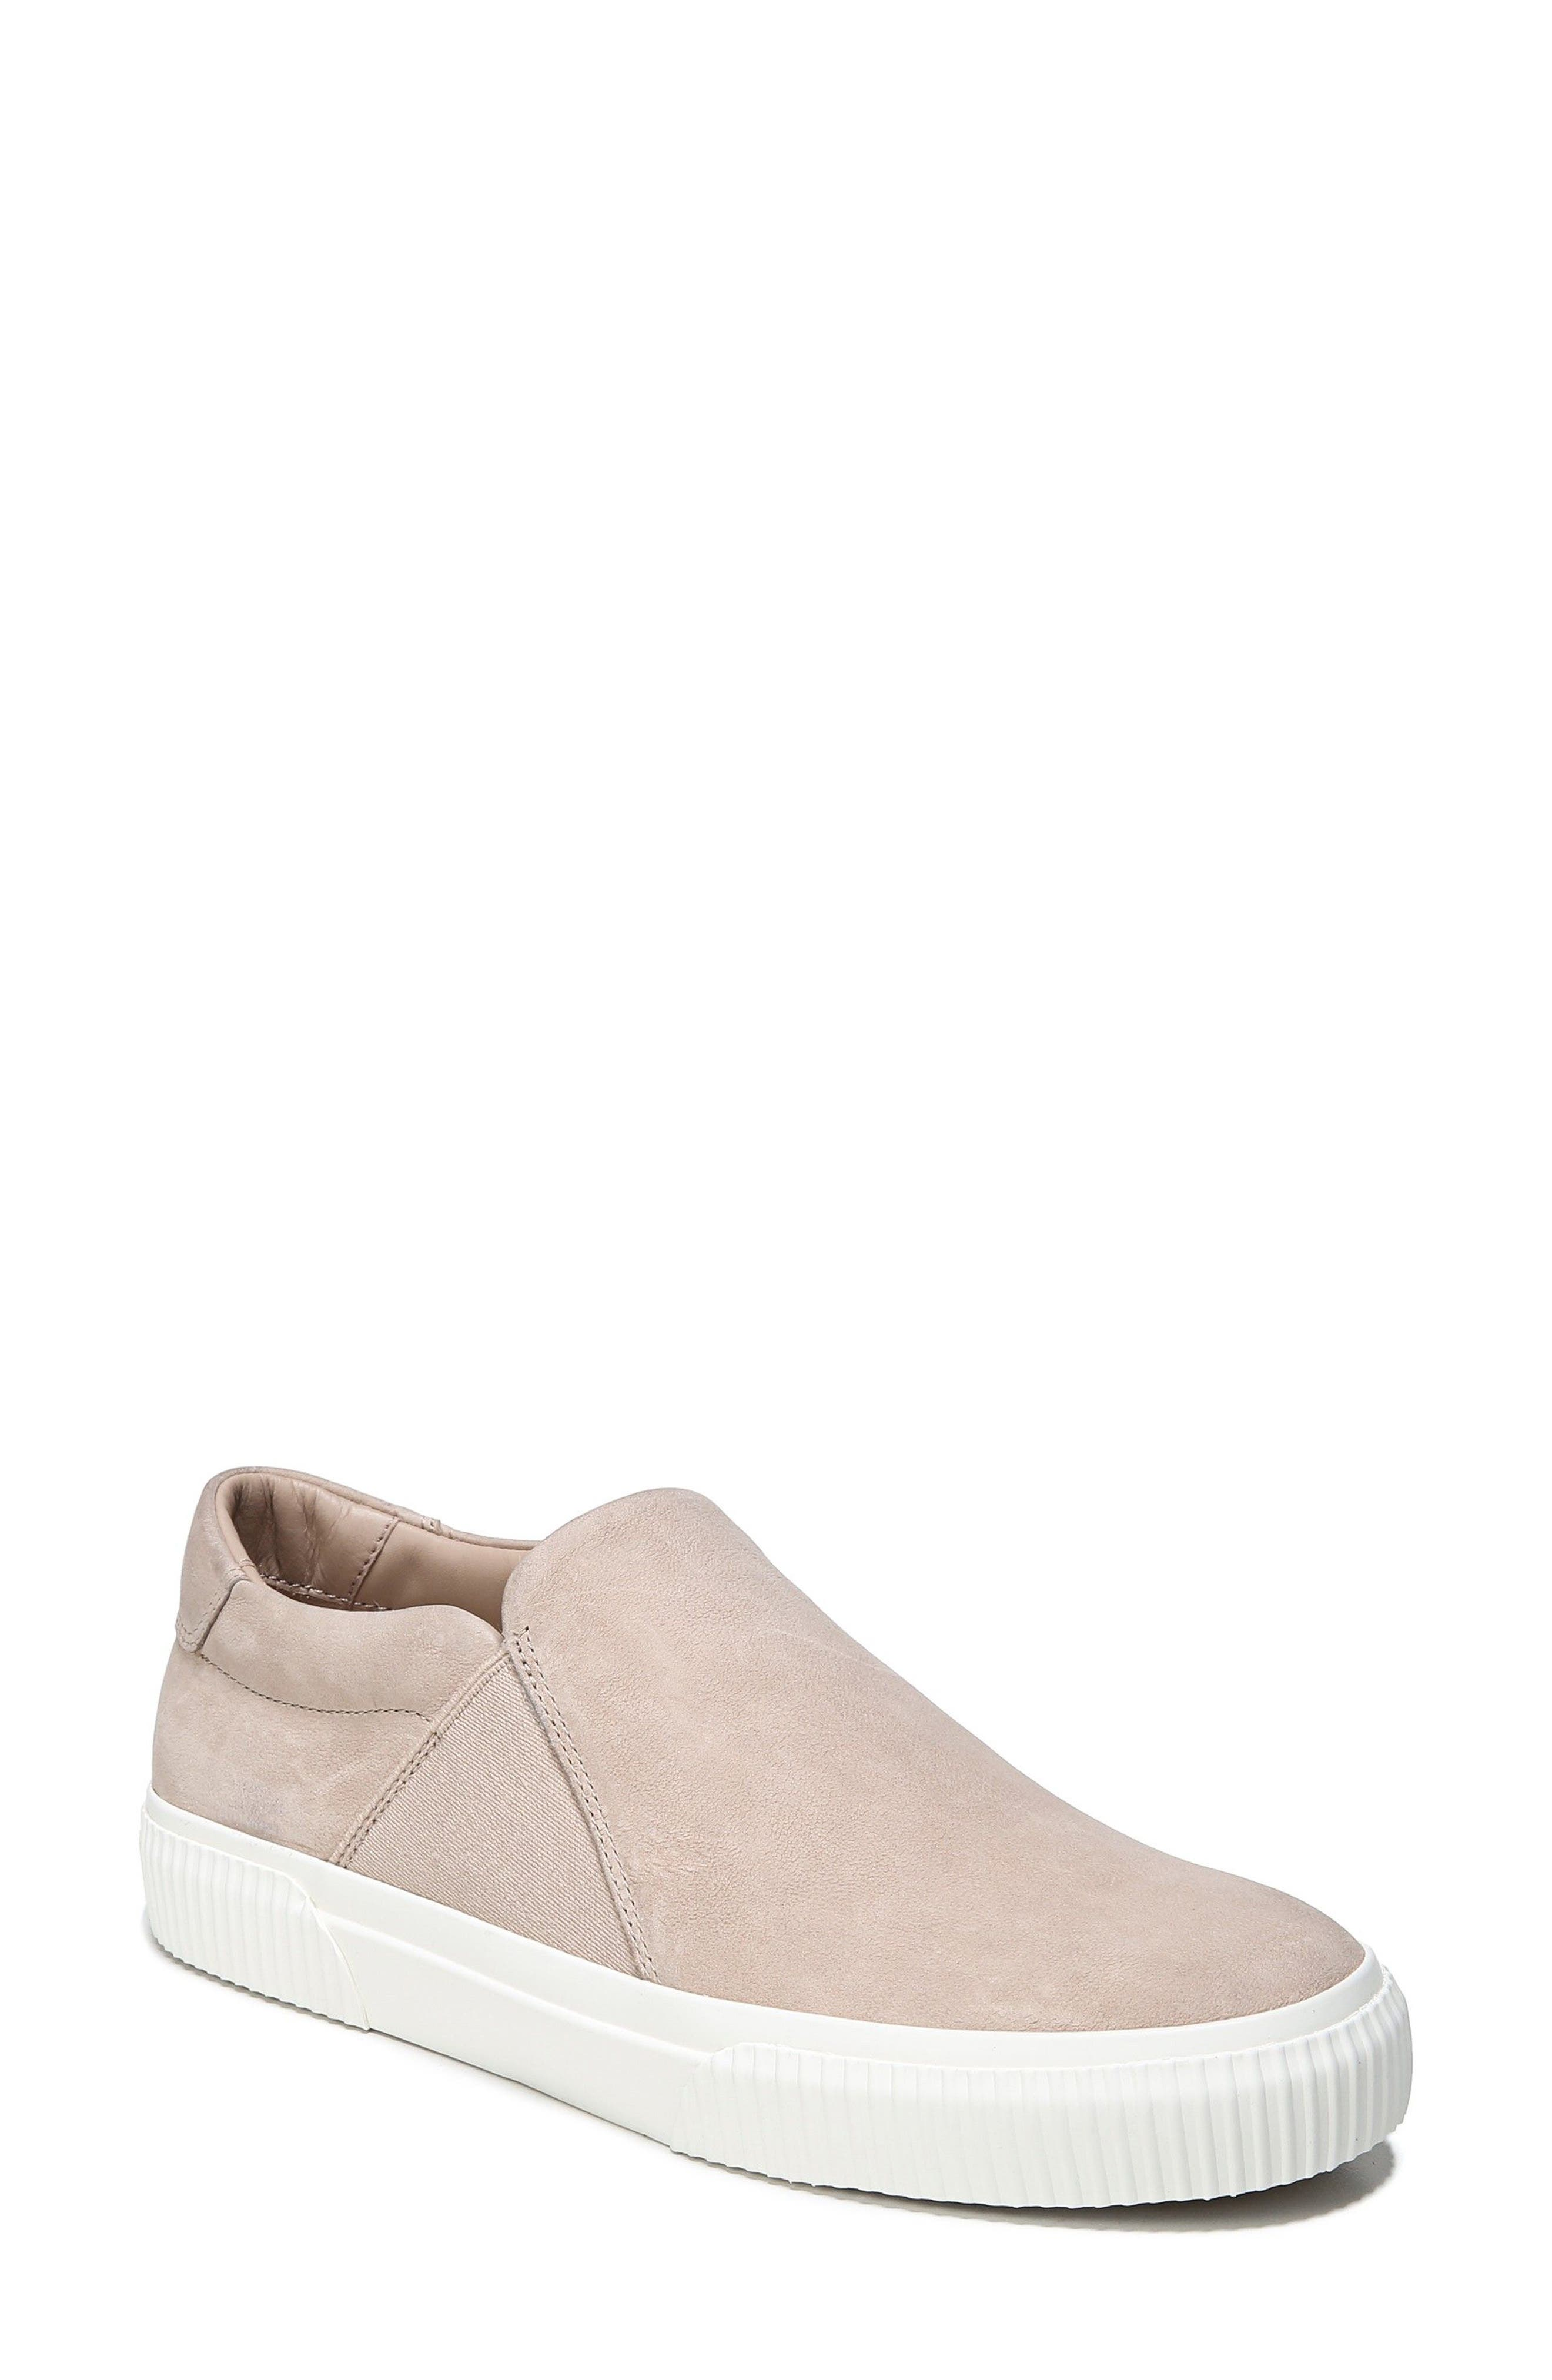 Knox Slip-On Sneaker,                             Main thumbnail 2, color,